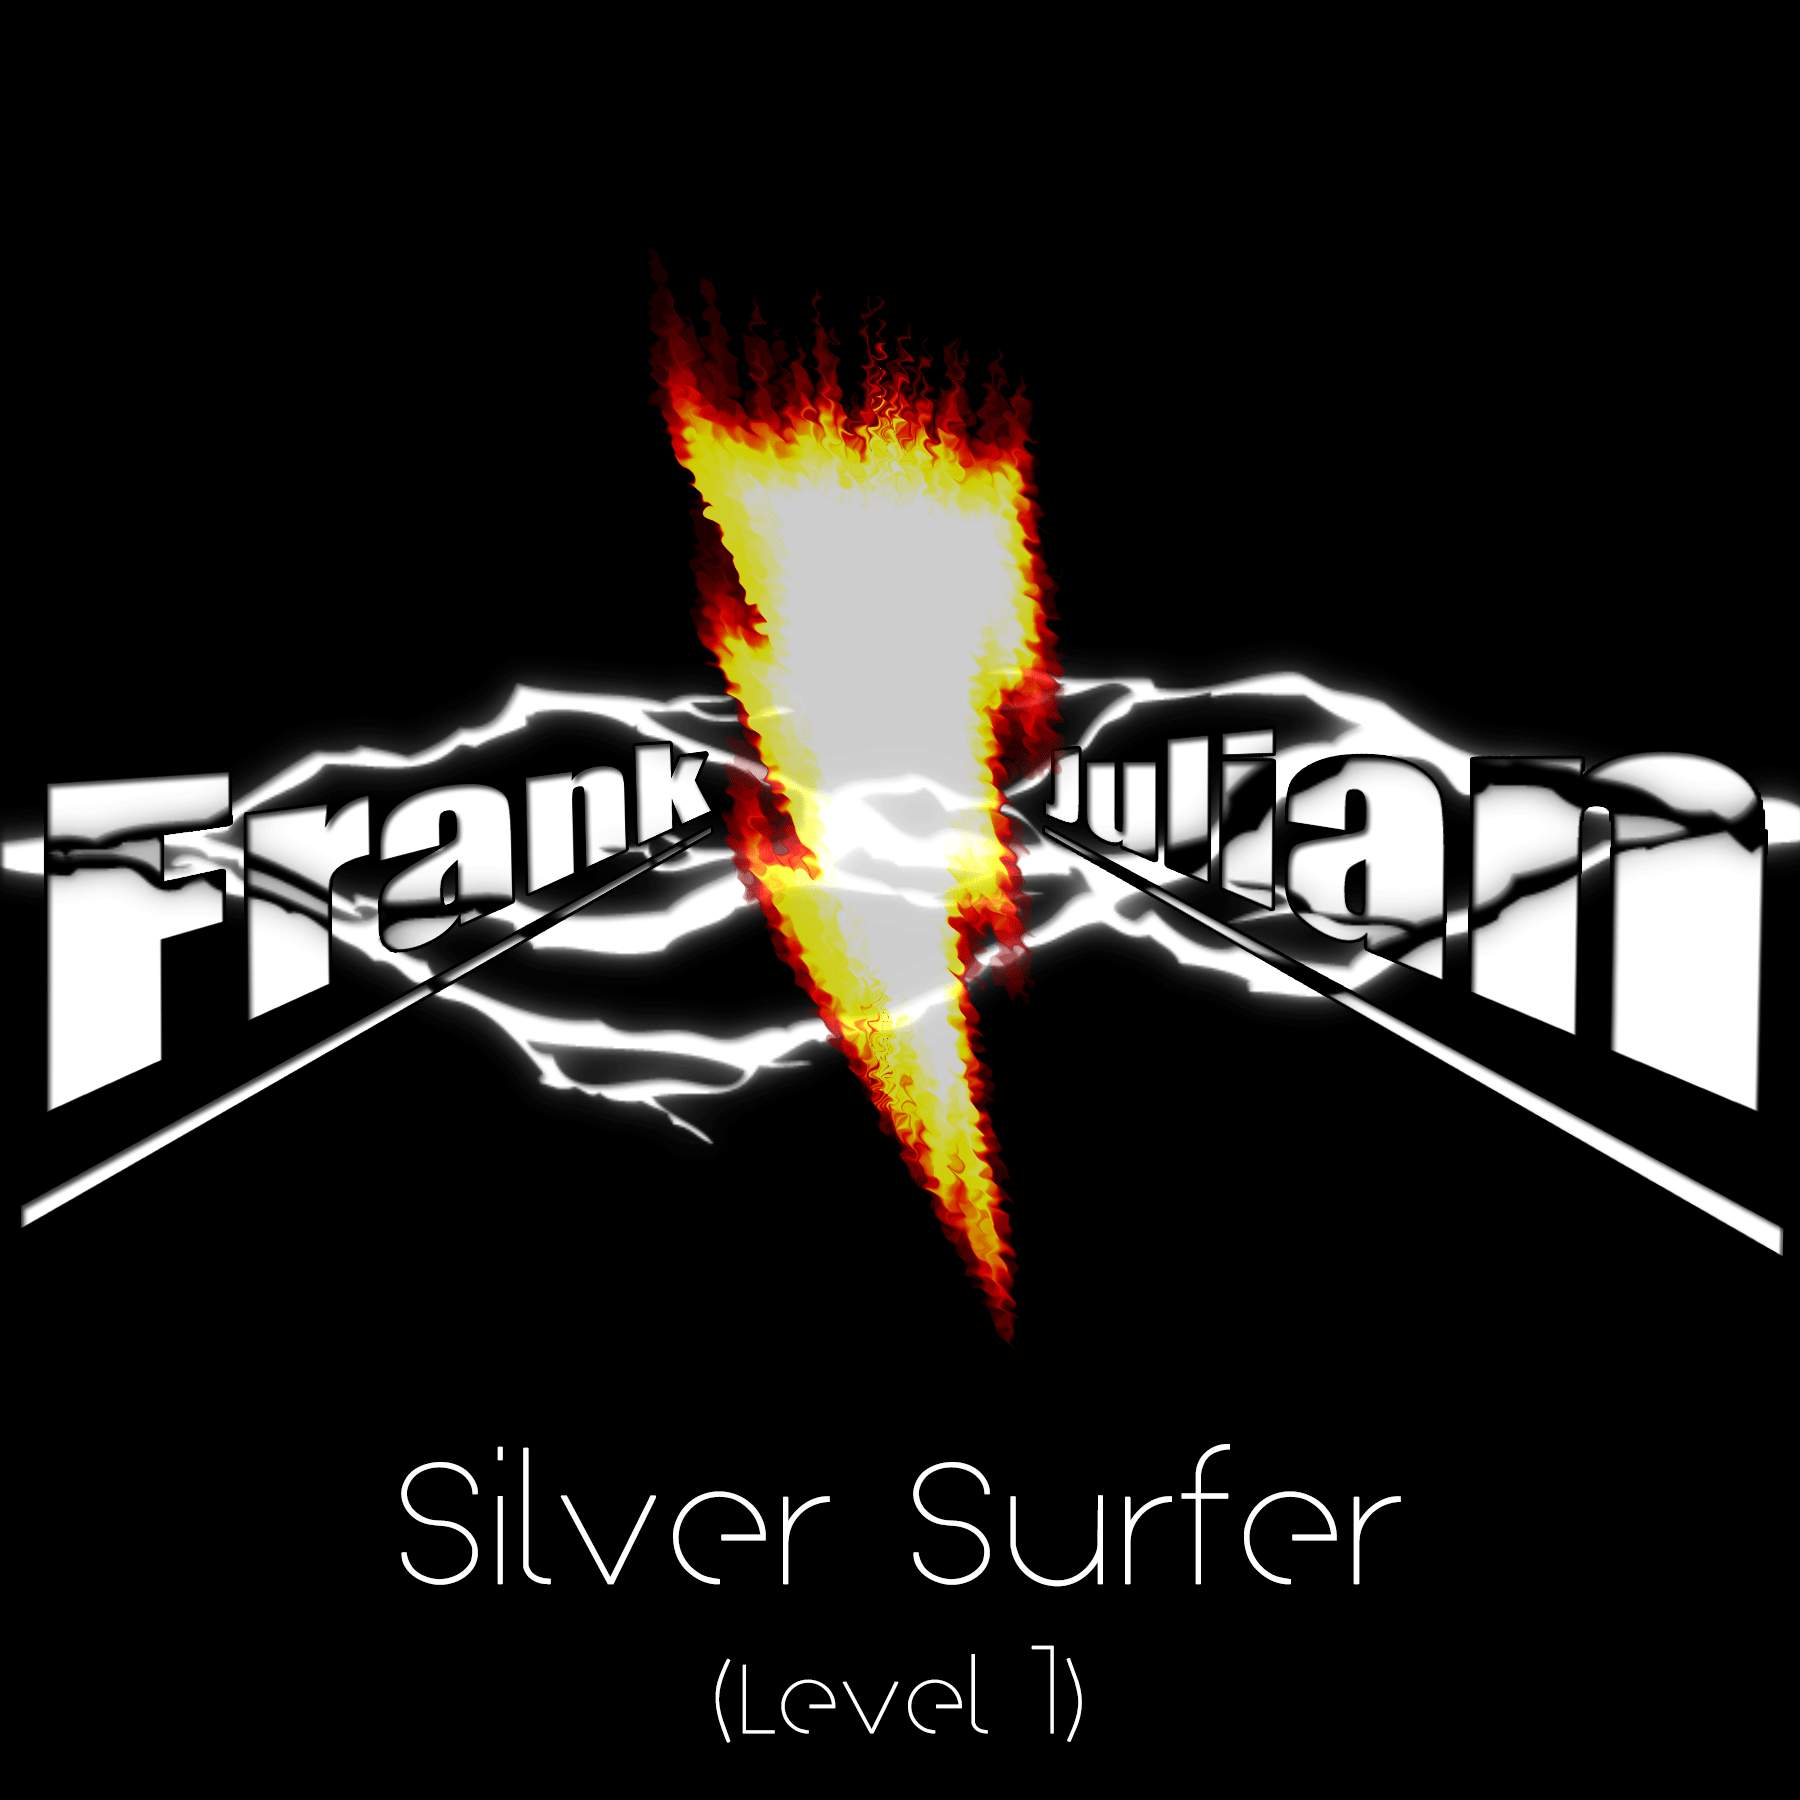 Julian, Frank: Frank Julian meets Silver Surfer: Level 1 (NES Main Theme Metal Cover)